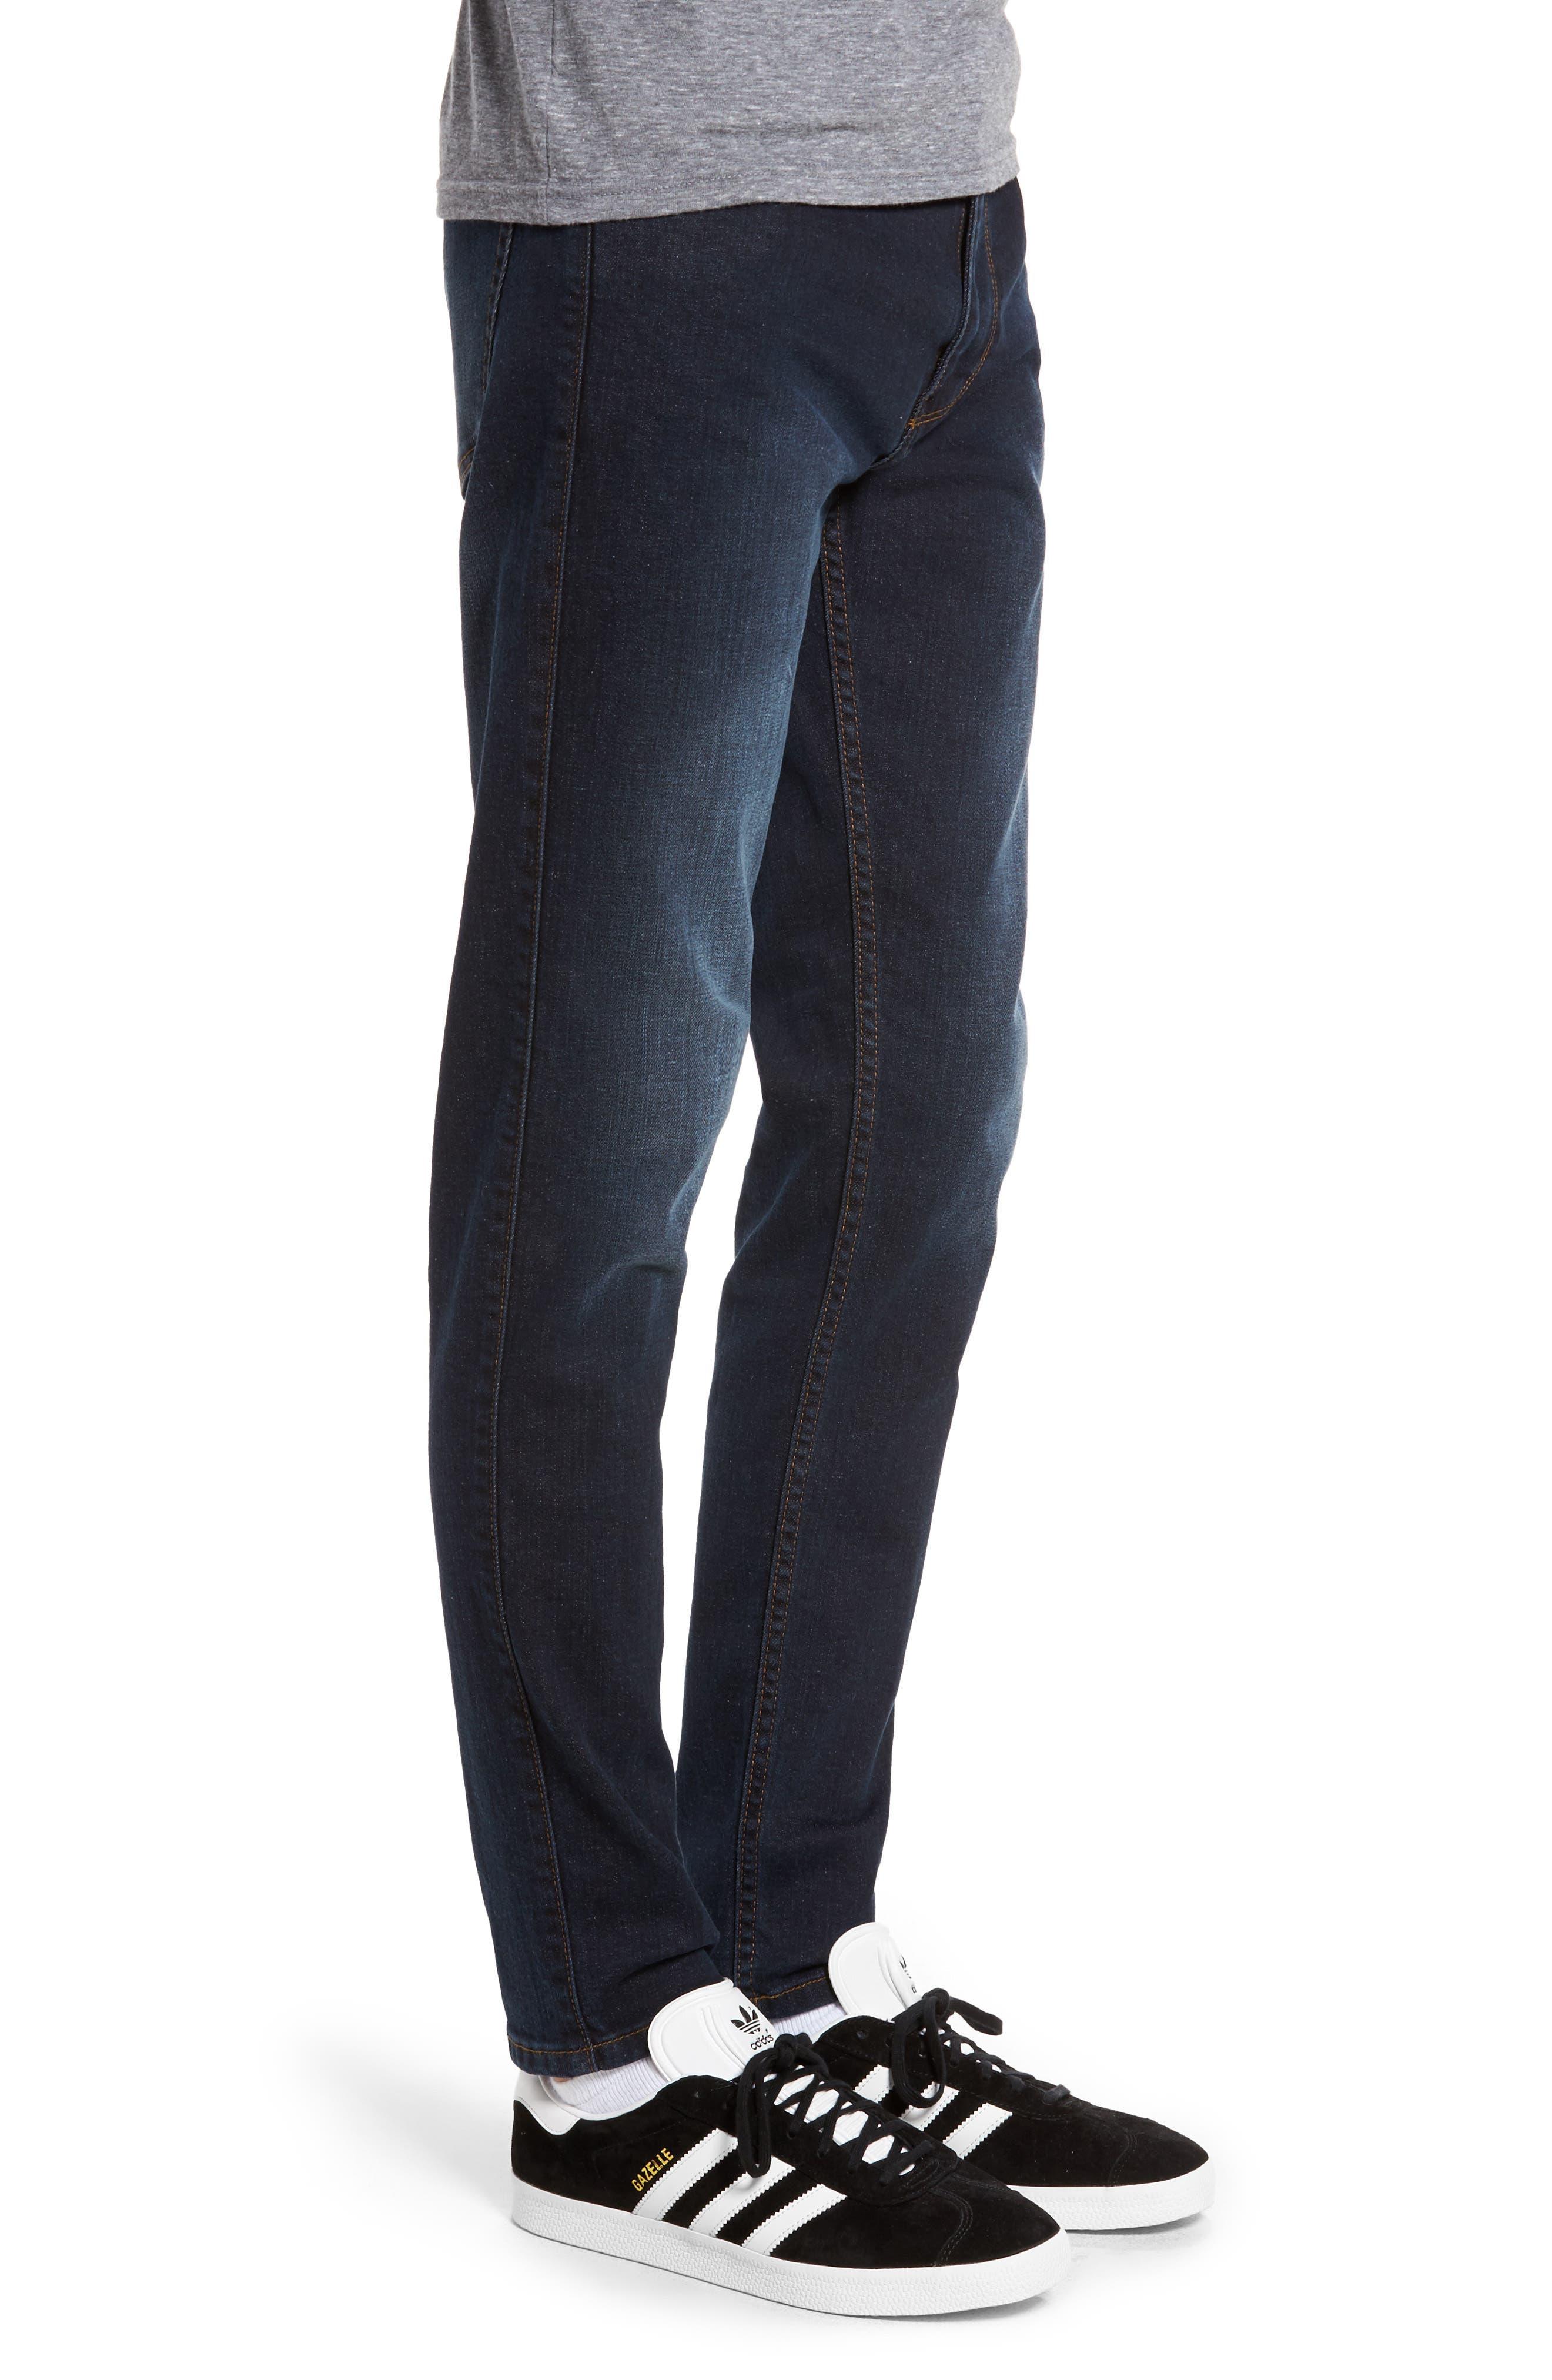 Clark Sim Straight Fit Jeans,                             Alternate thumbnail 3, color,                             Worn Dark Blue